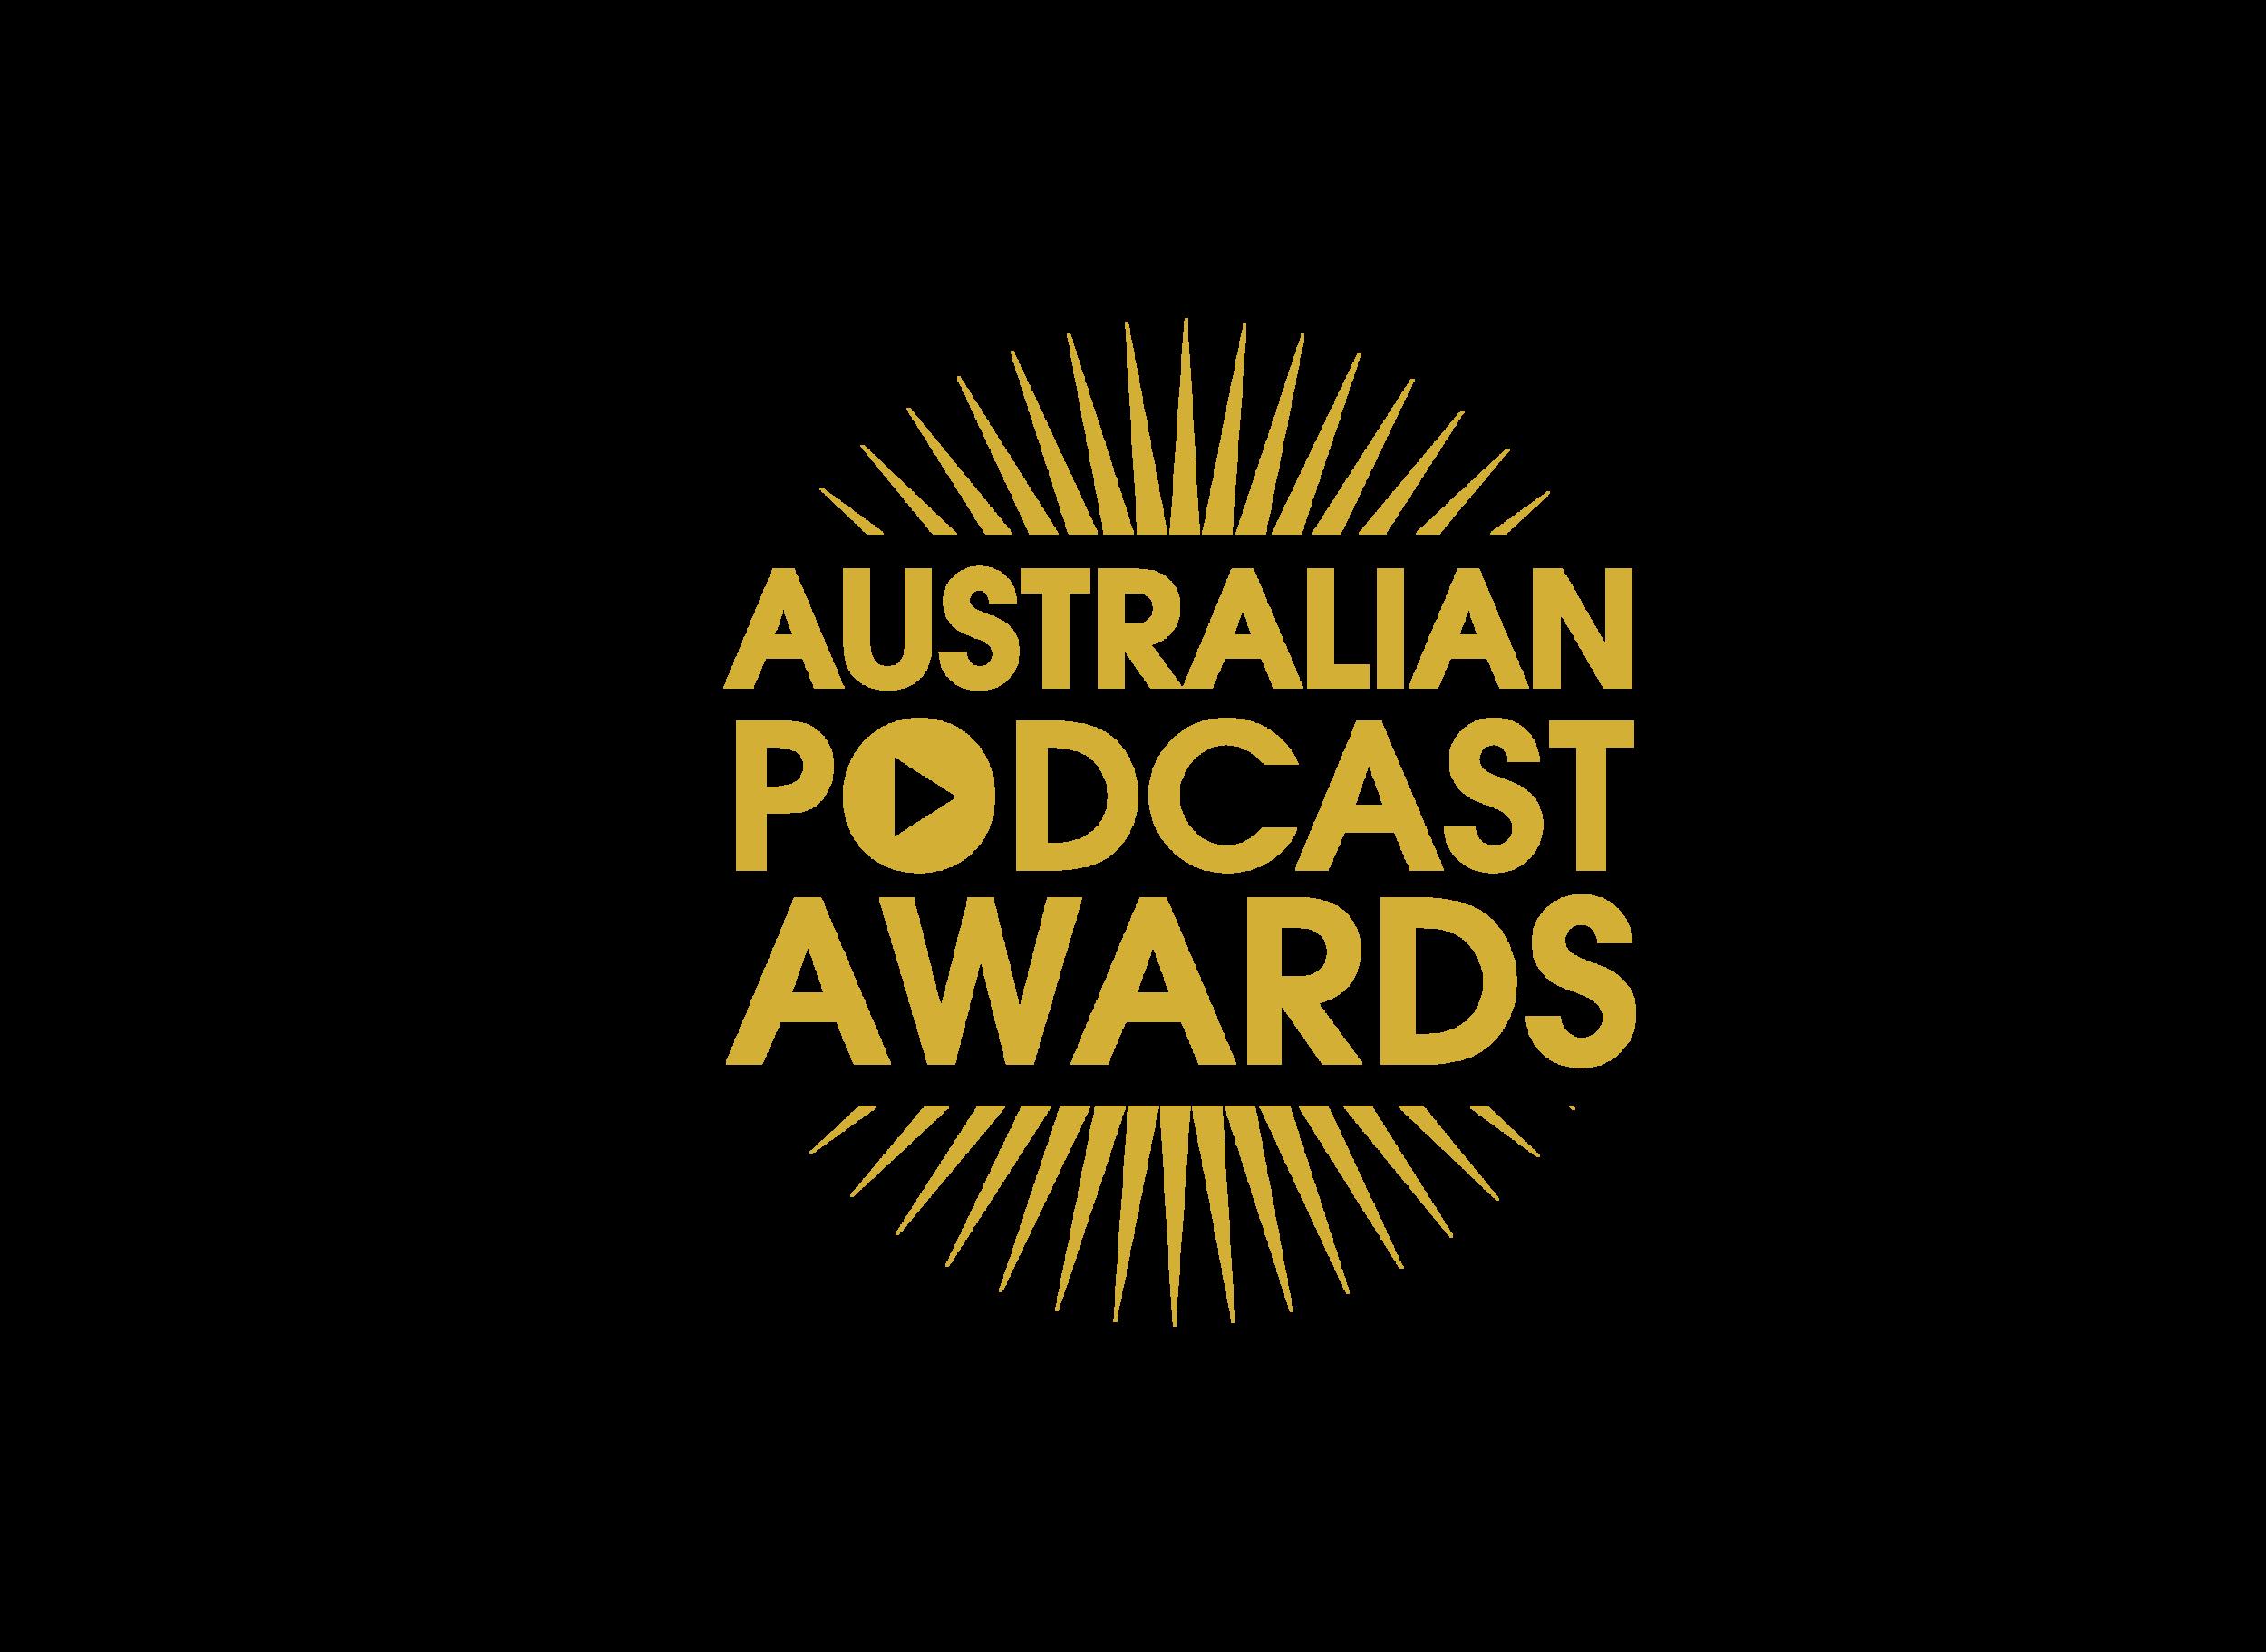 _original_australian-podcast-awards-03 (1).png